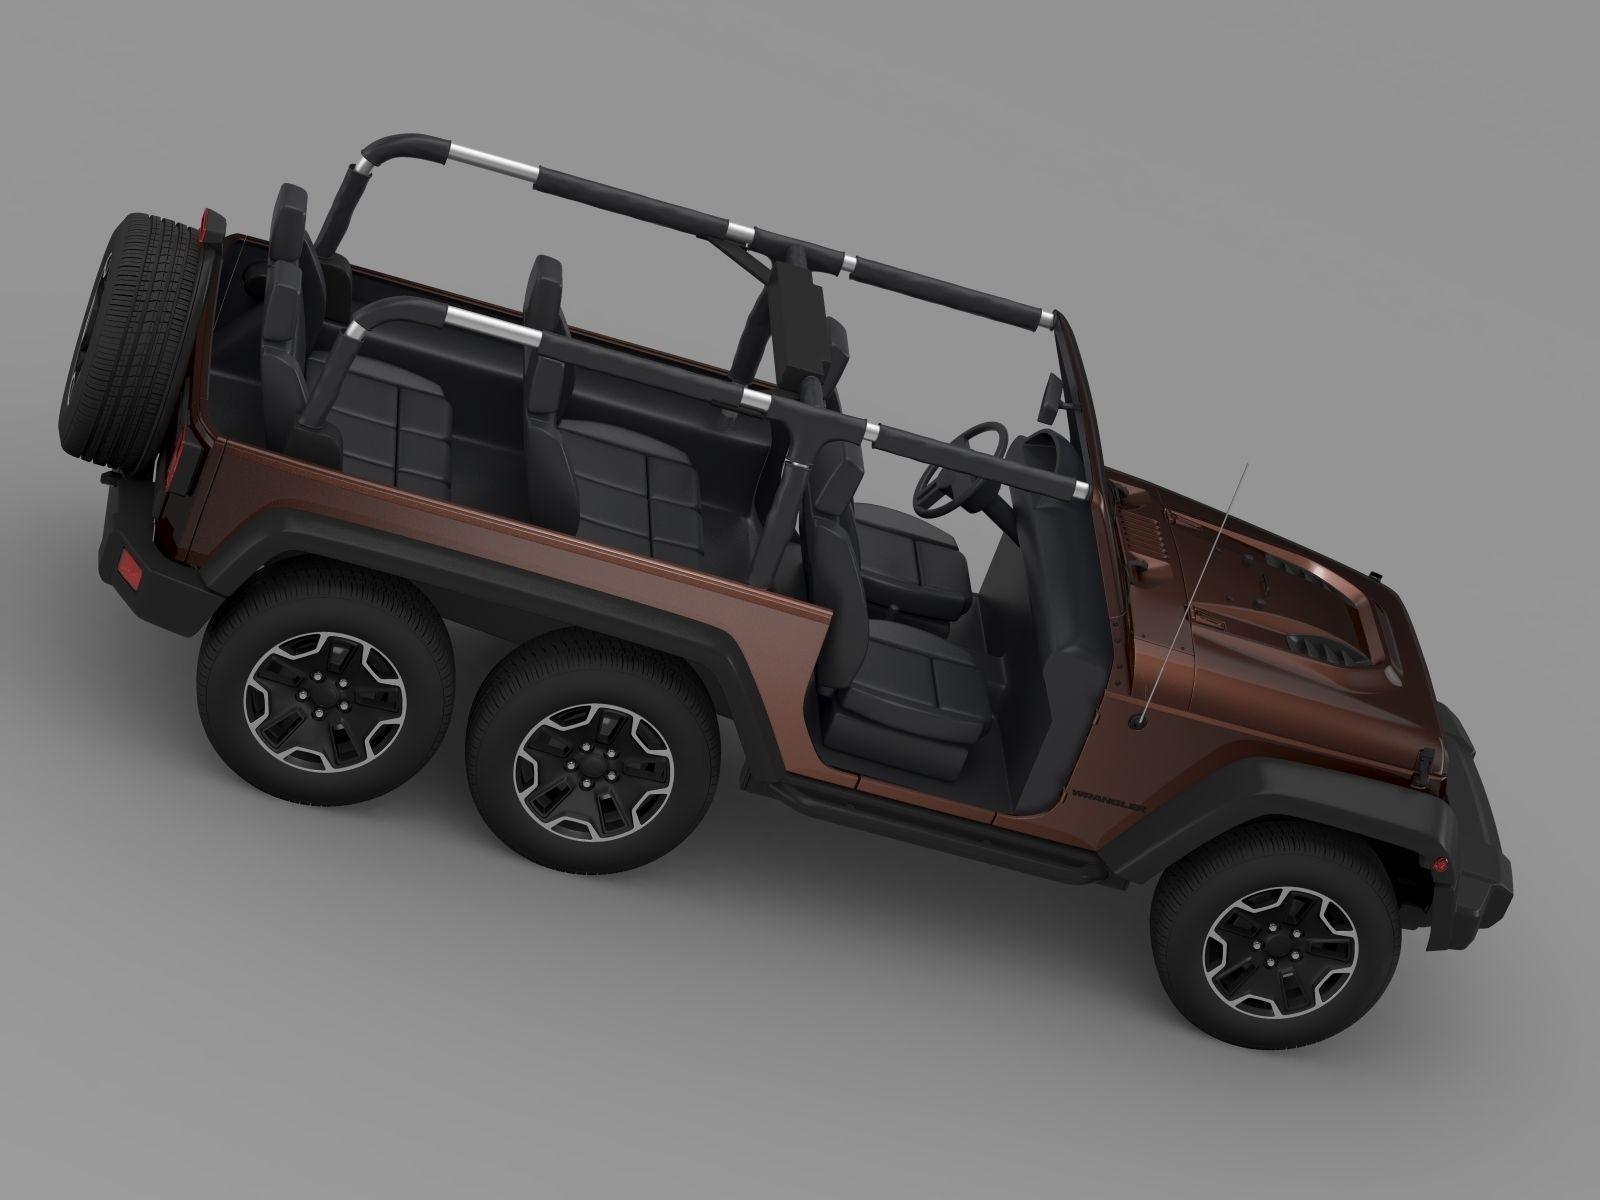 Jeep Wrangler Rubicon 6x6 2016 3d Model Cgtrader 2005 Fuel Filter Max Obj Mtl 3ds Fbx C4d Lwo Lw Lws